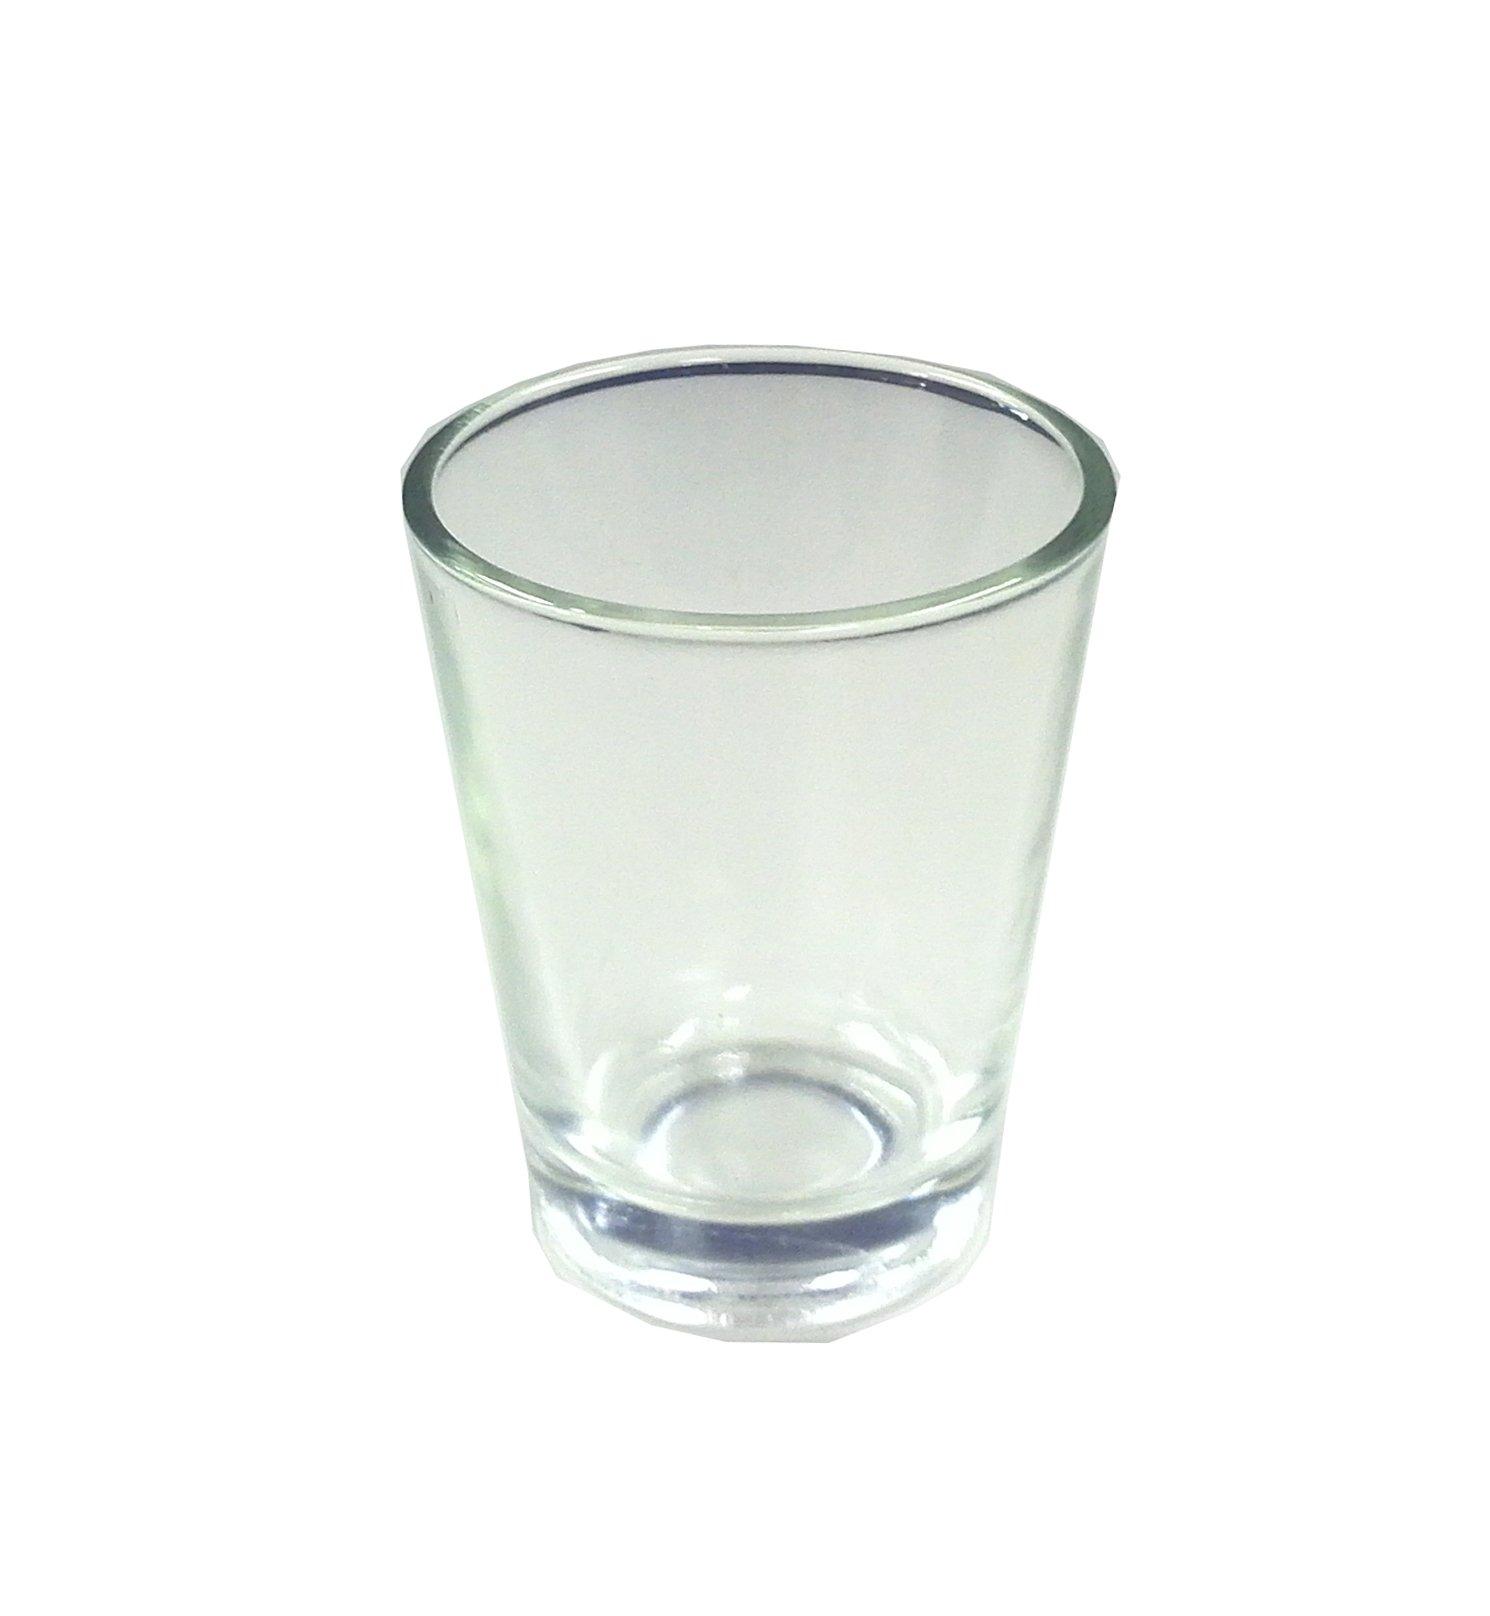 FixtureDisplays Clear Shot Glass Spirit Liquor Glass 15185-NF